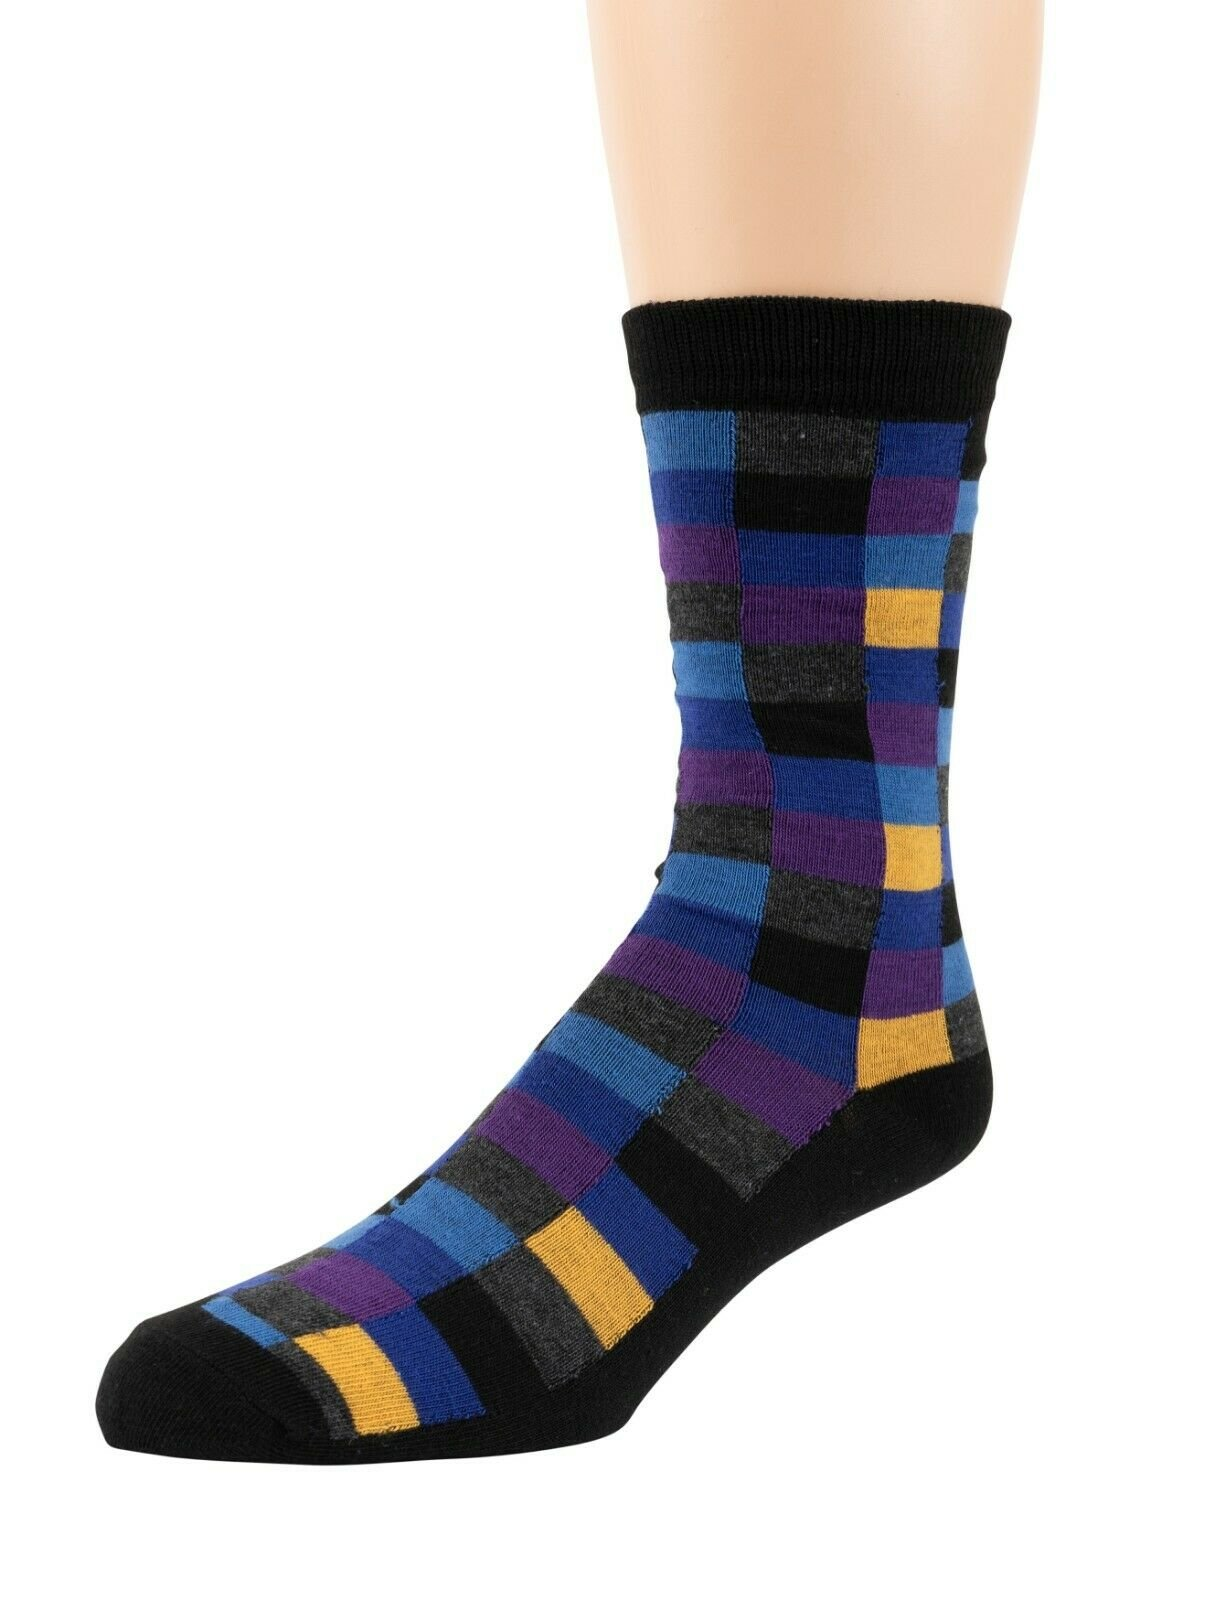 Mitch-Bogen-Mens-Cotton-Dress-Socks-Colorful-Fashion-Crew-Socks-8-Pack-Gift-Box thumbnail 31